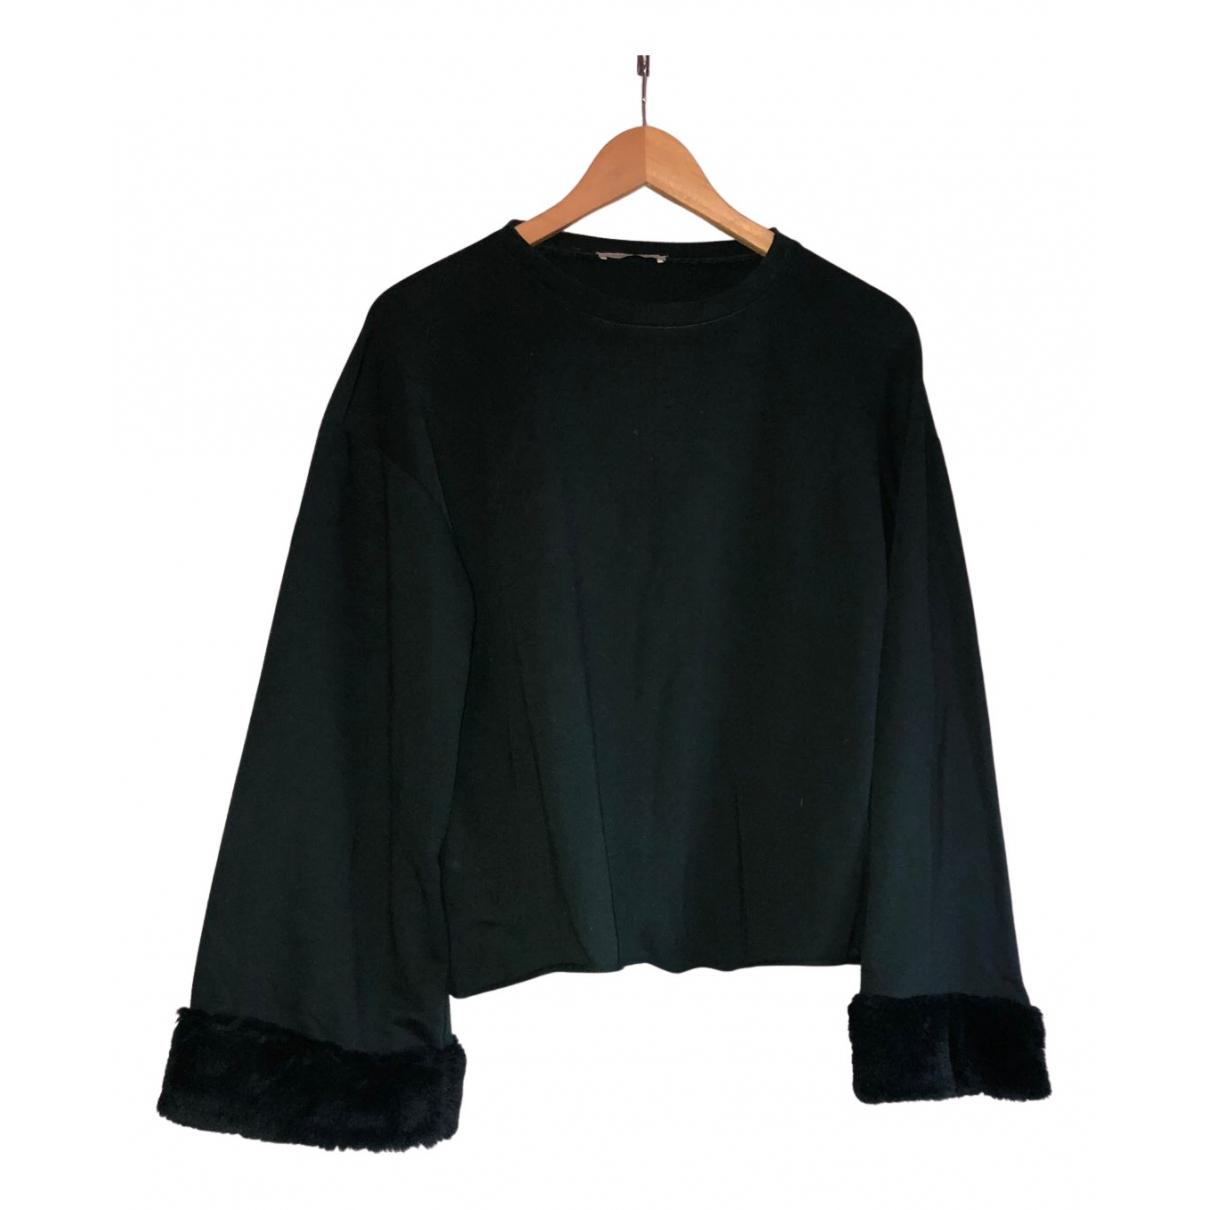 Zara N Black Cotton  top for Women S International